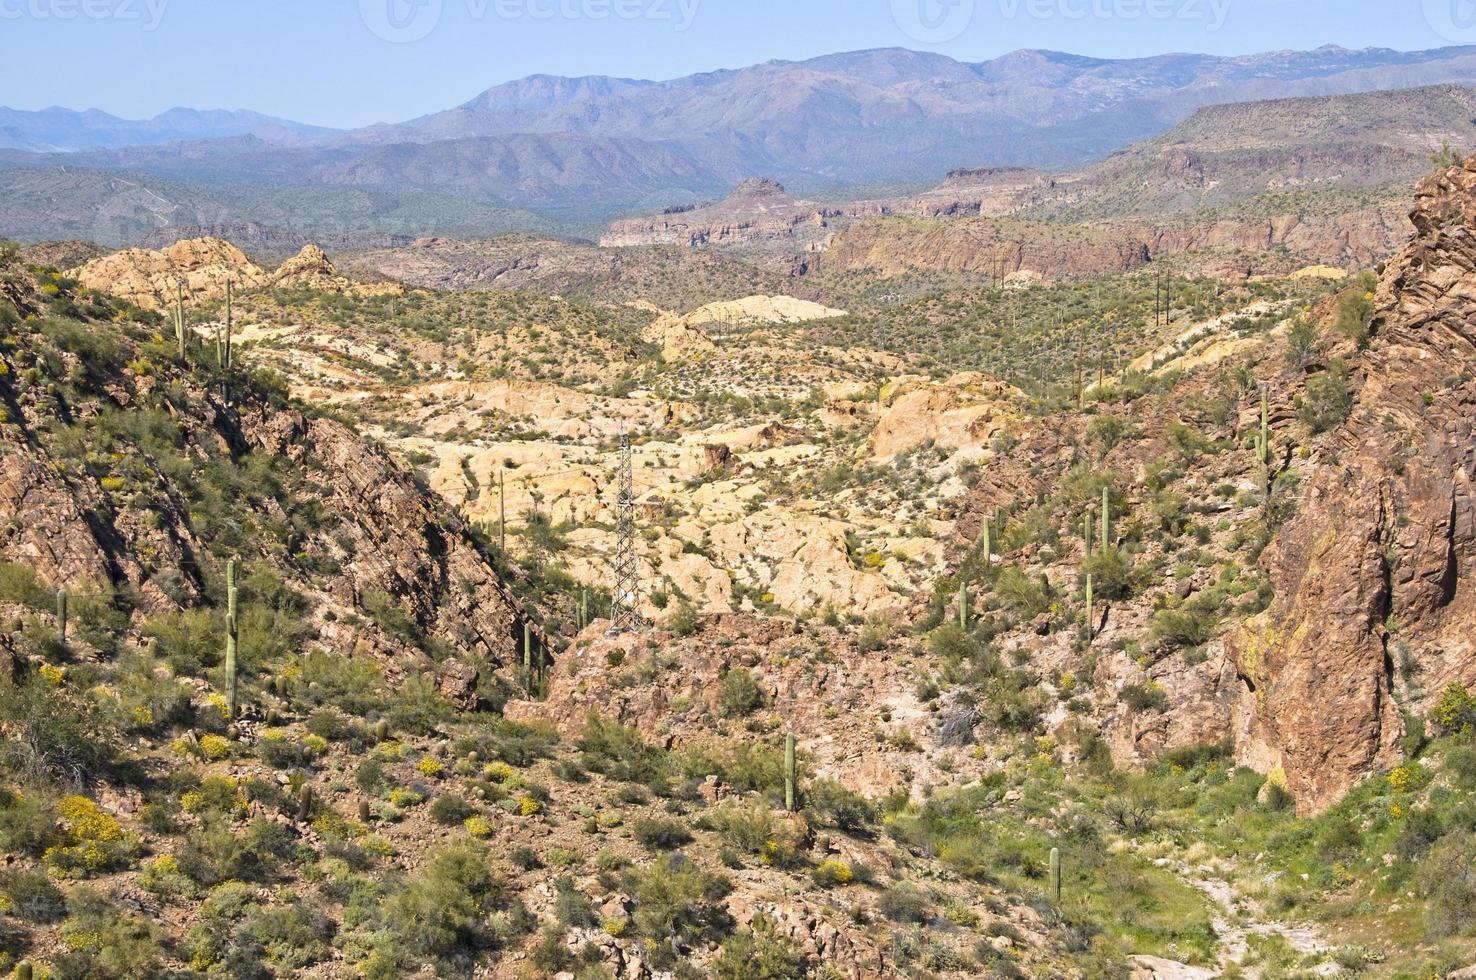 Desert landscape in Arizona photo